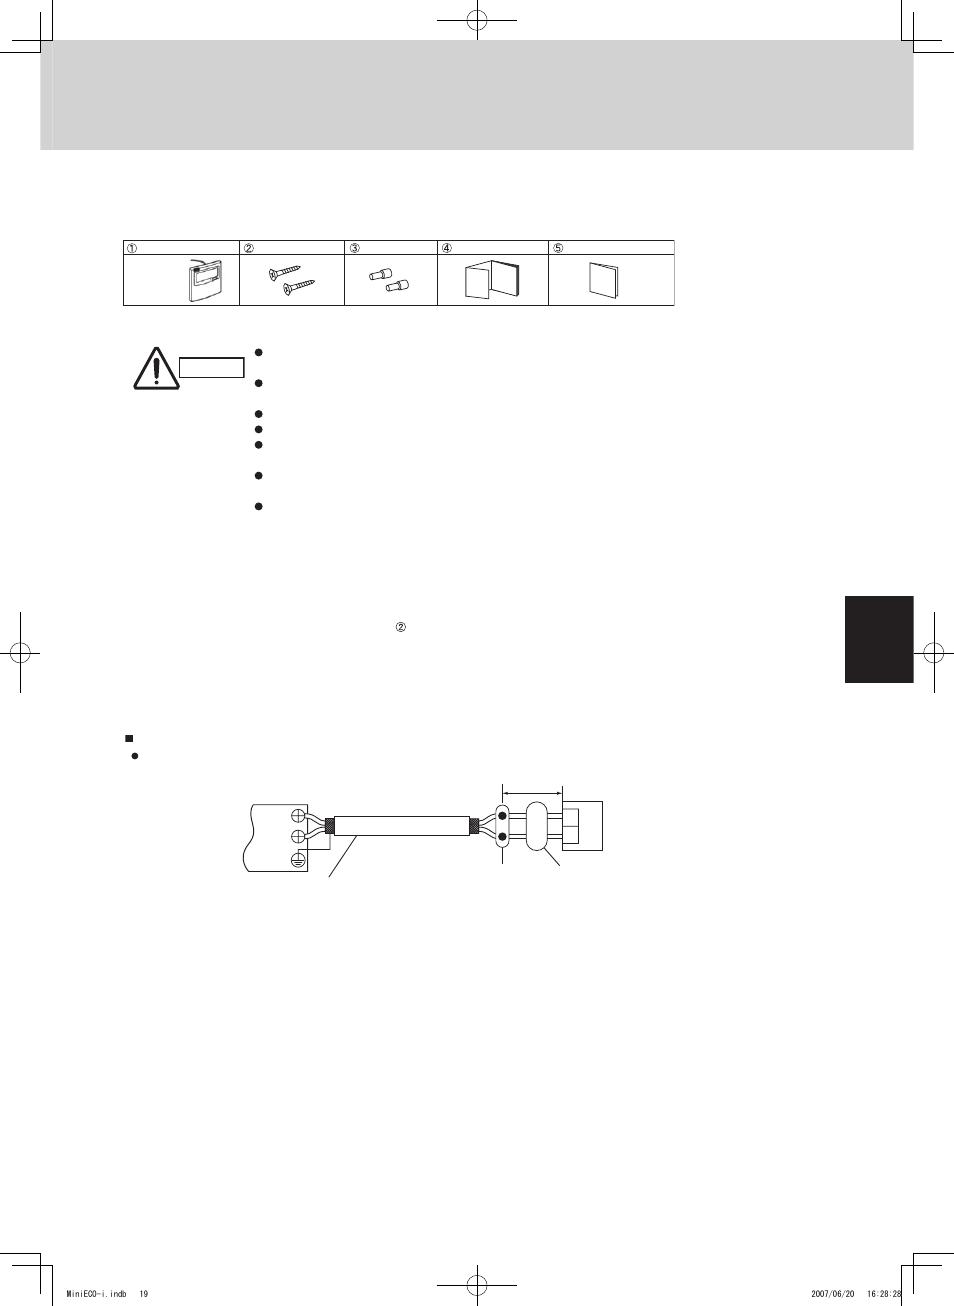 timer remote controller rcs tm80bg sanyo chx06052 user manual rh manualsdir com Procedure Manual User Manual PDF